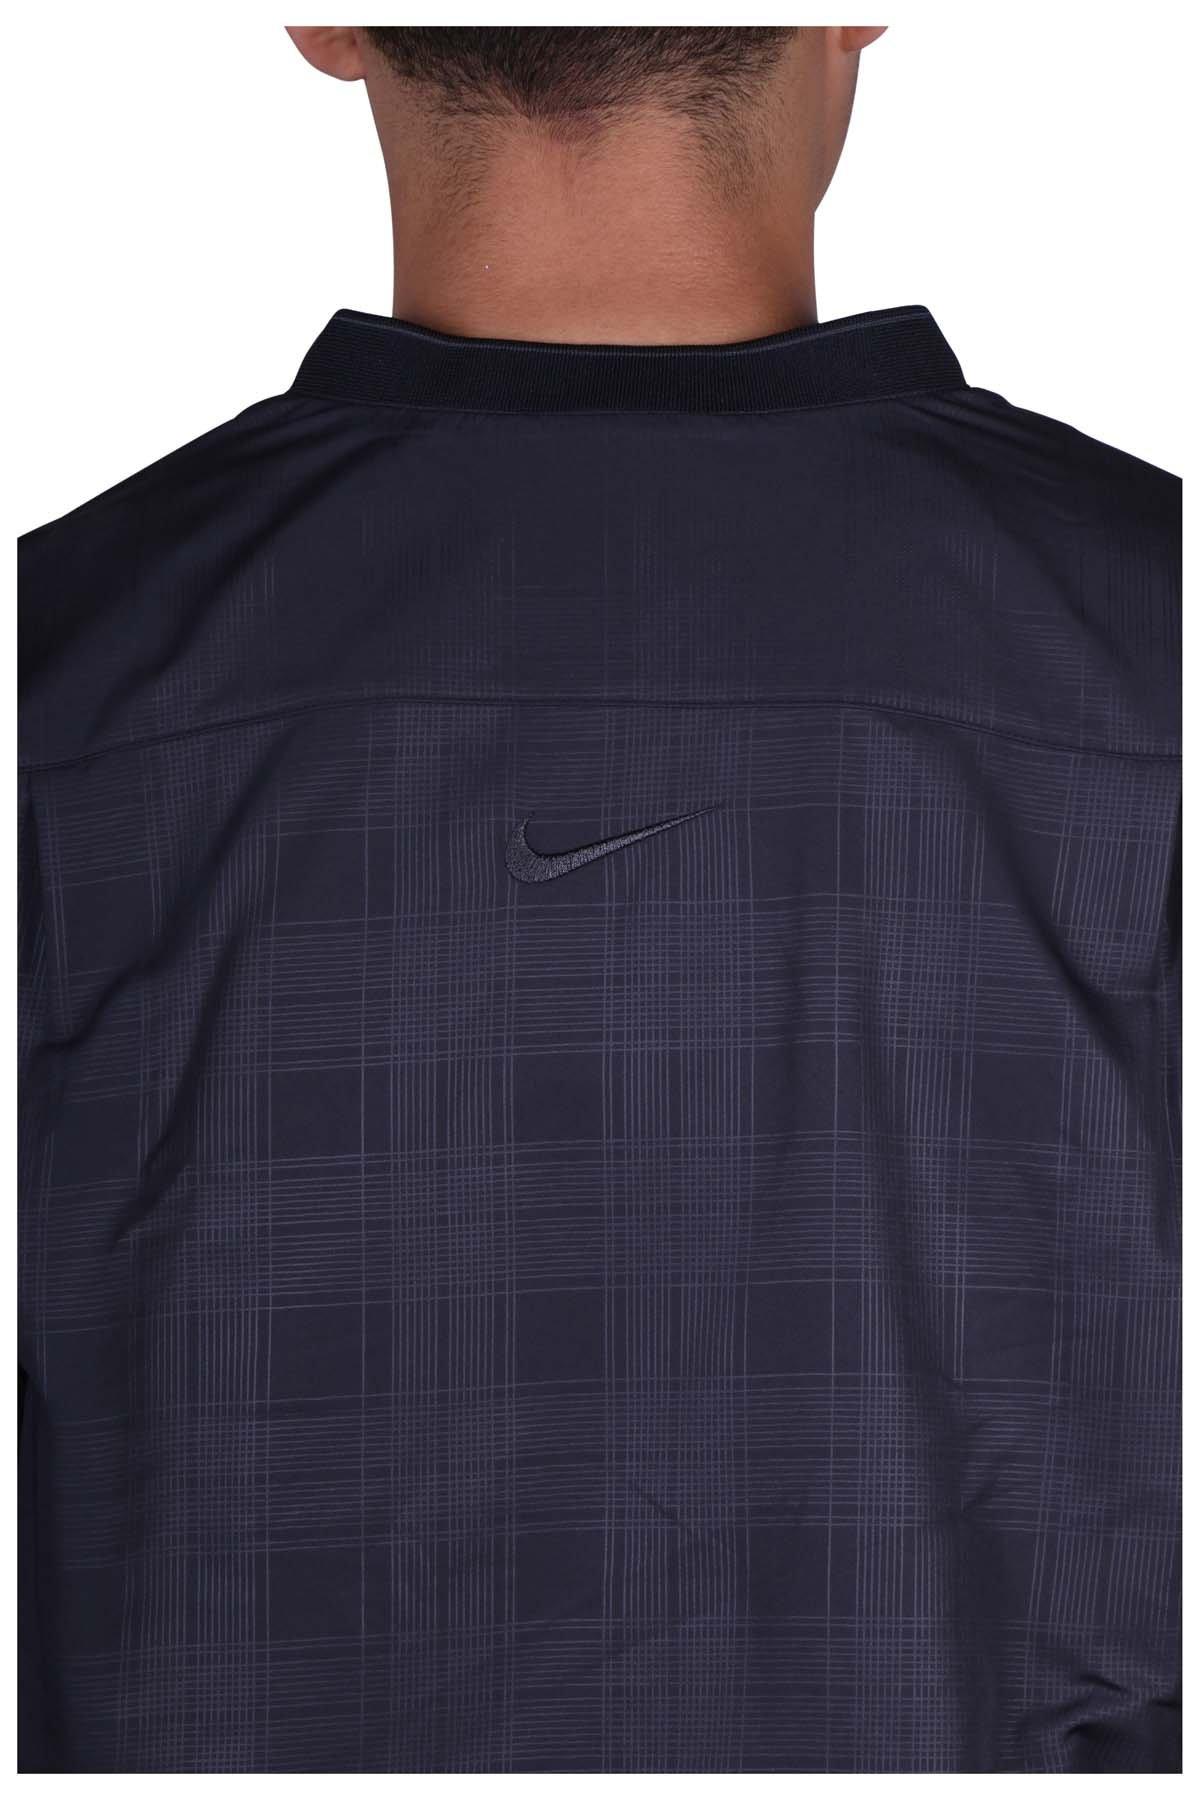 Nike Golf Men's Classic Half Zip Wind Jacket (Black, Small) by Nike Golf (Image #3)